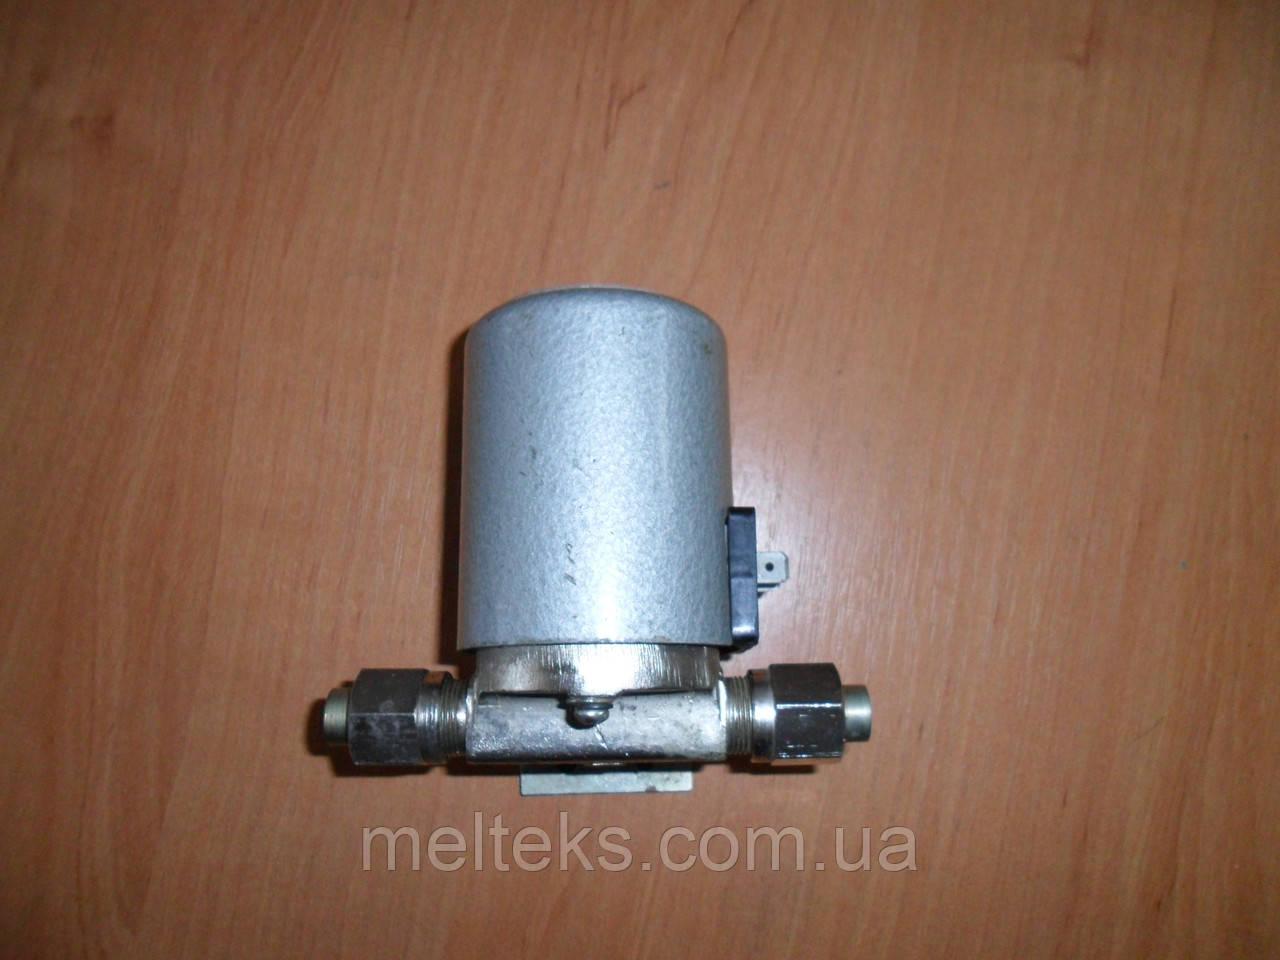 Вентиль клапан КСФ-6